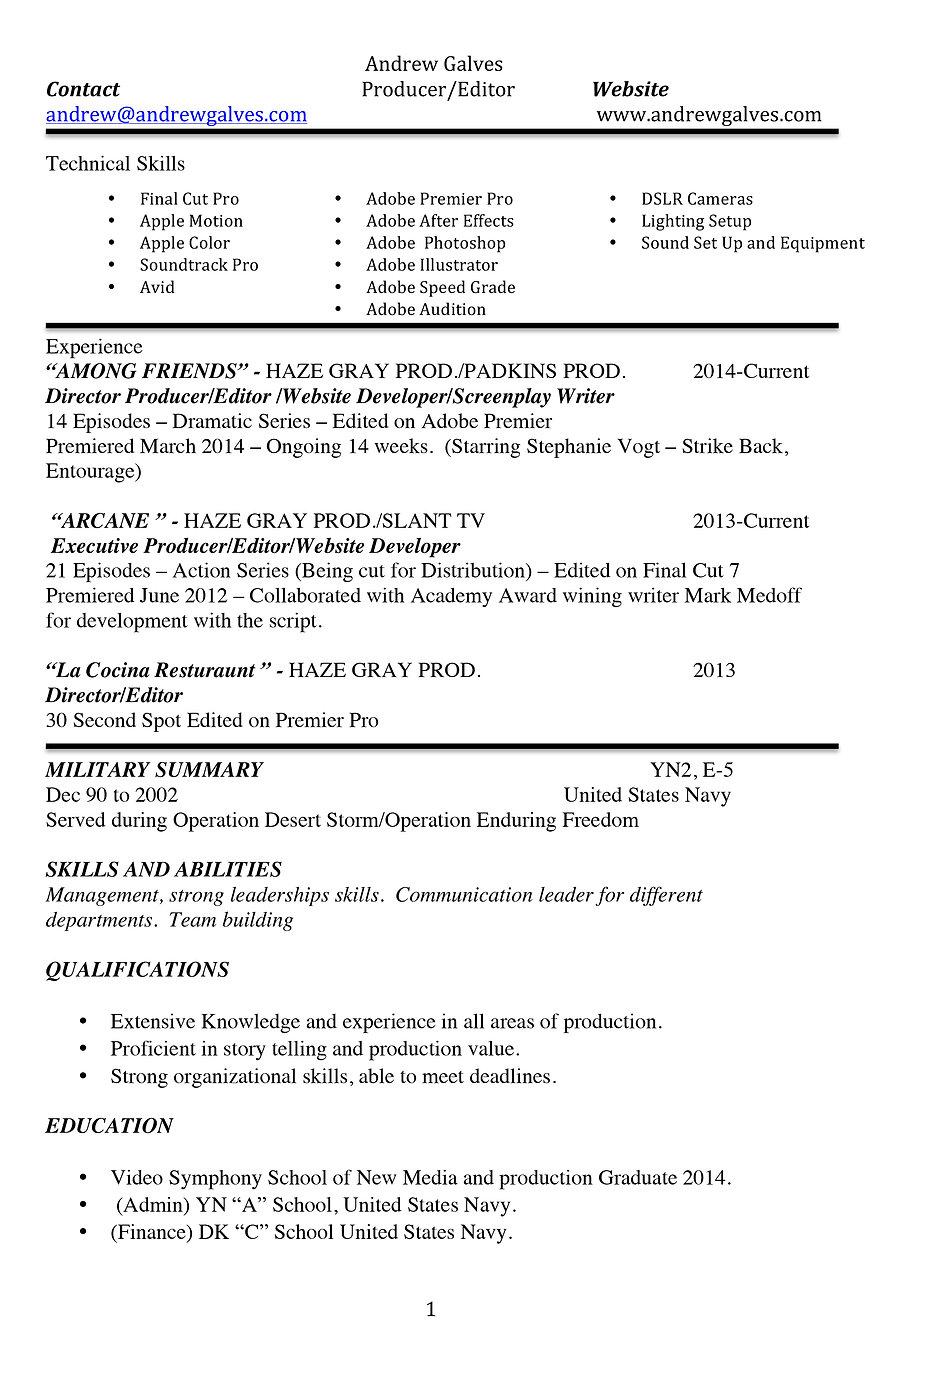 Haze Gray Productions Resume